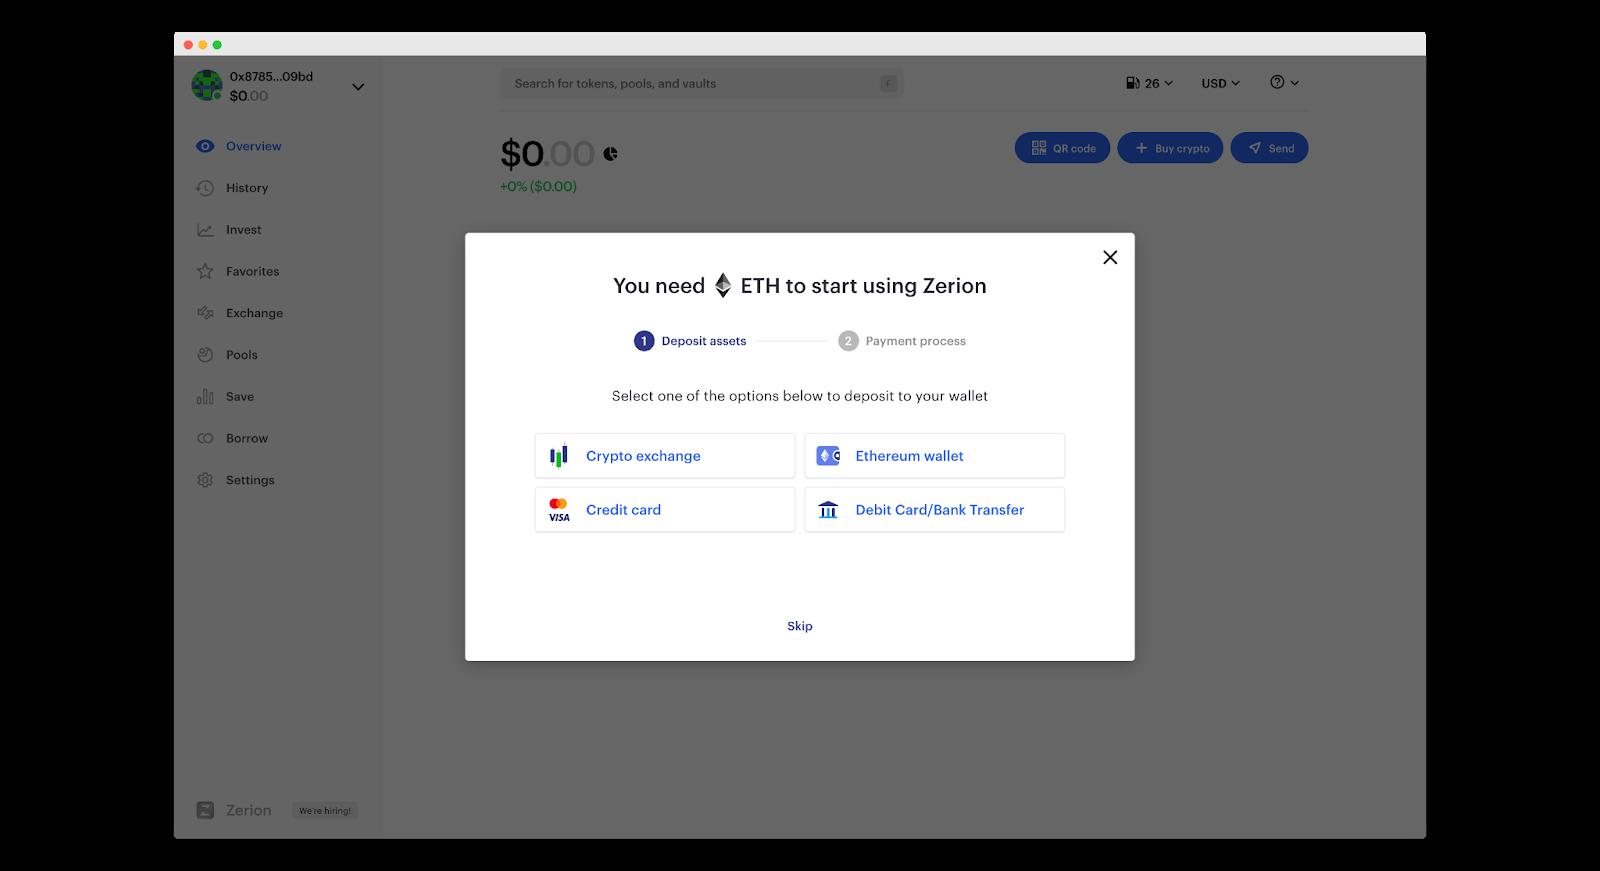 How do I create an Ethereum wallet?